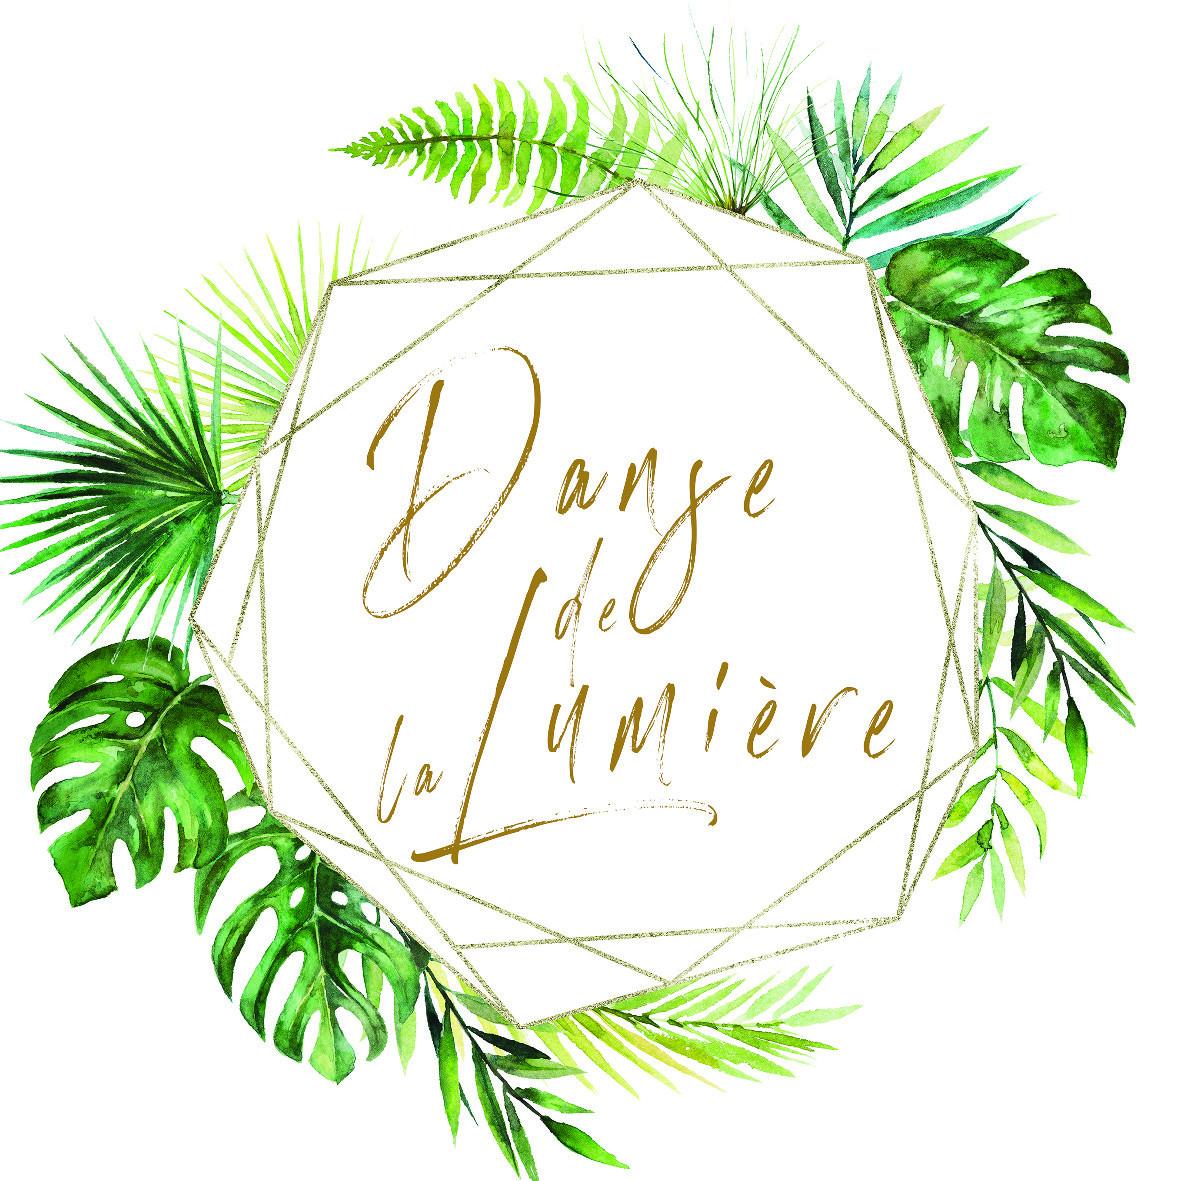 201906_Danse de la Lumière_logo_p001.jpg